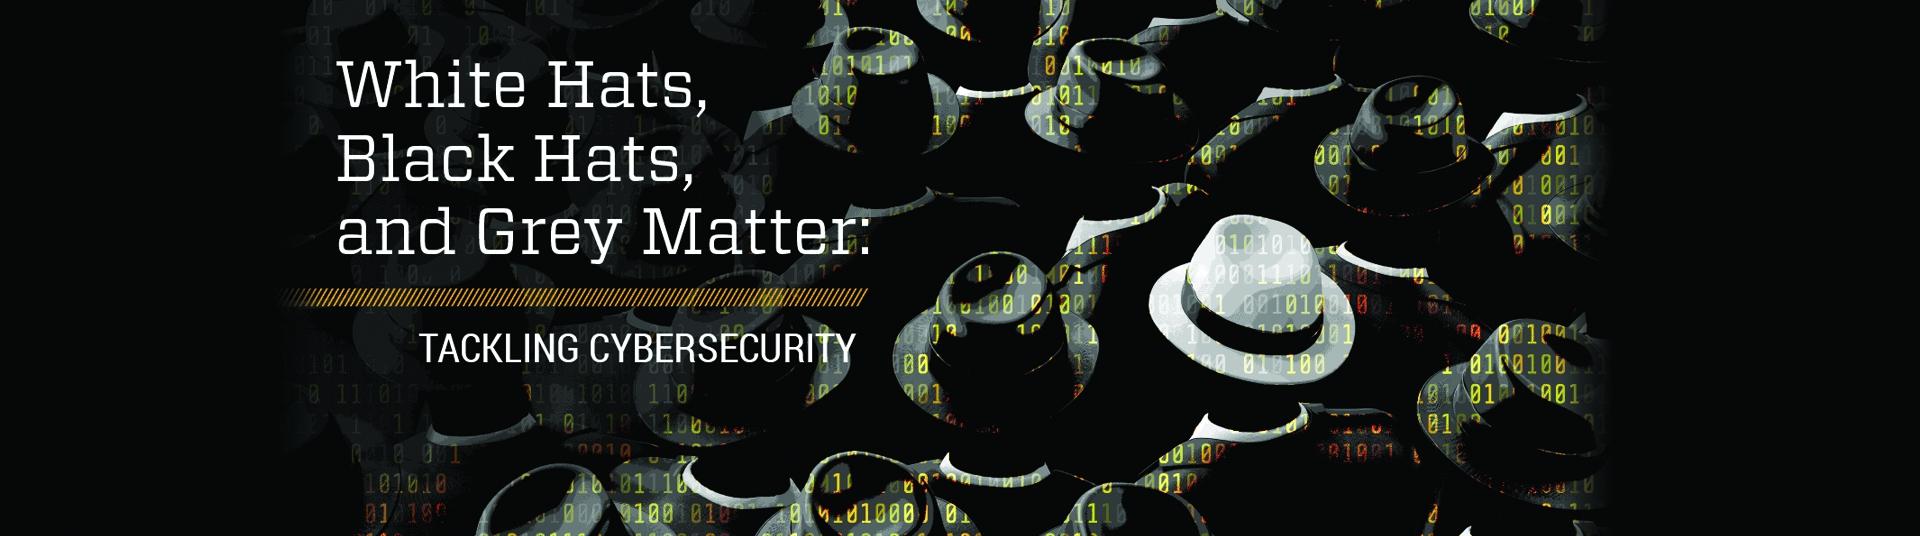 Georgia Tech Cybersecurity_White Hats Black Hats Grey Matter